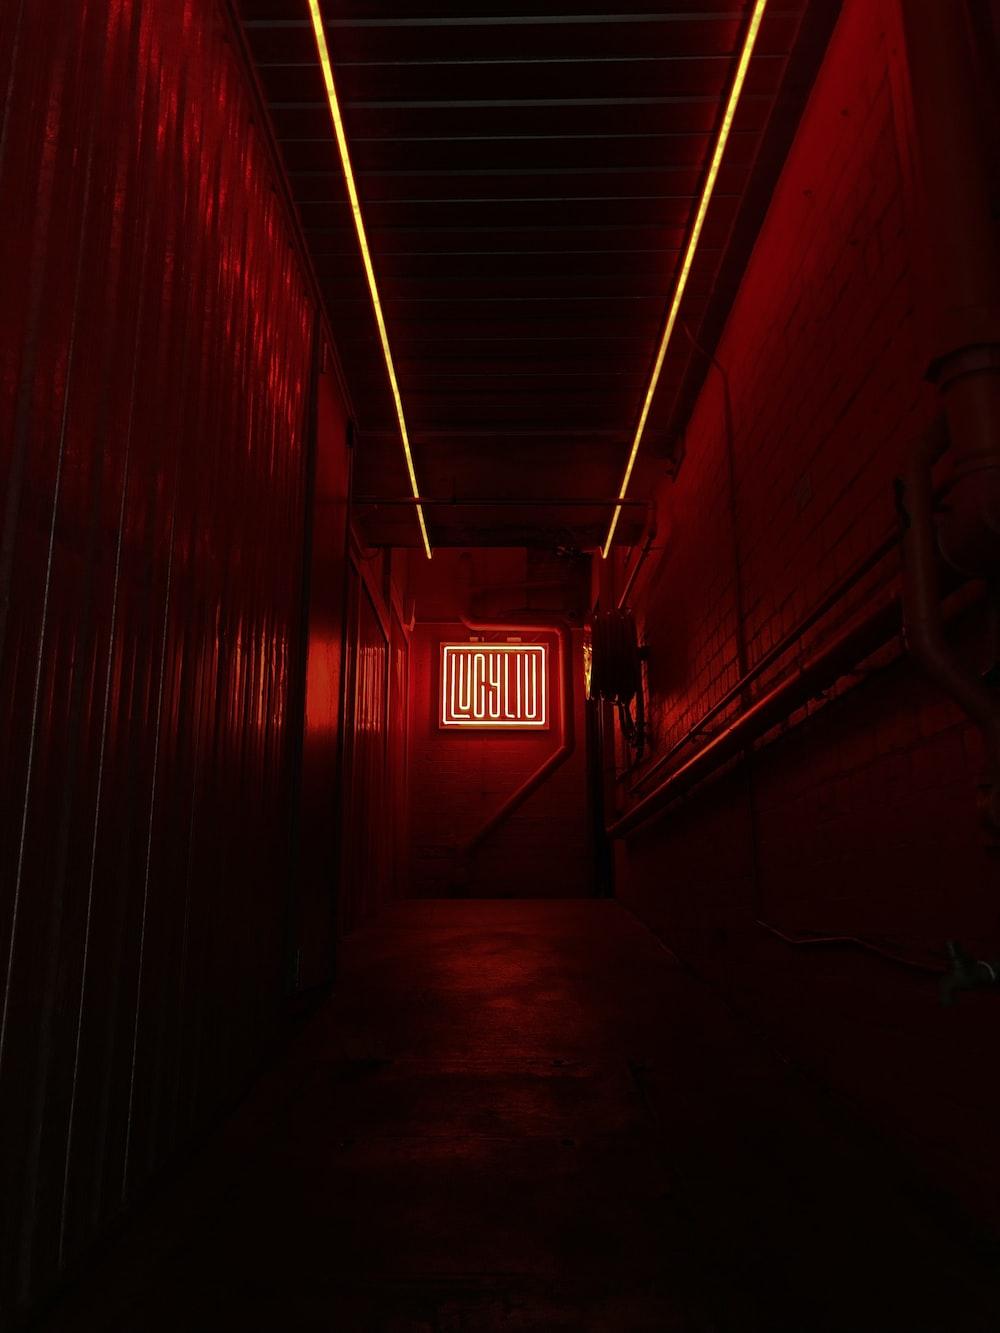 red illuminated sign